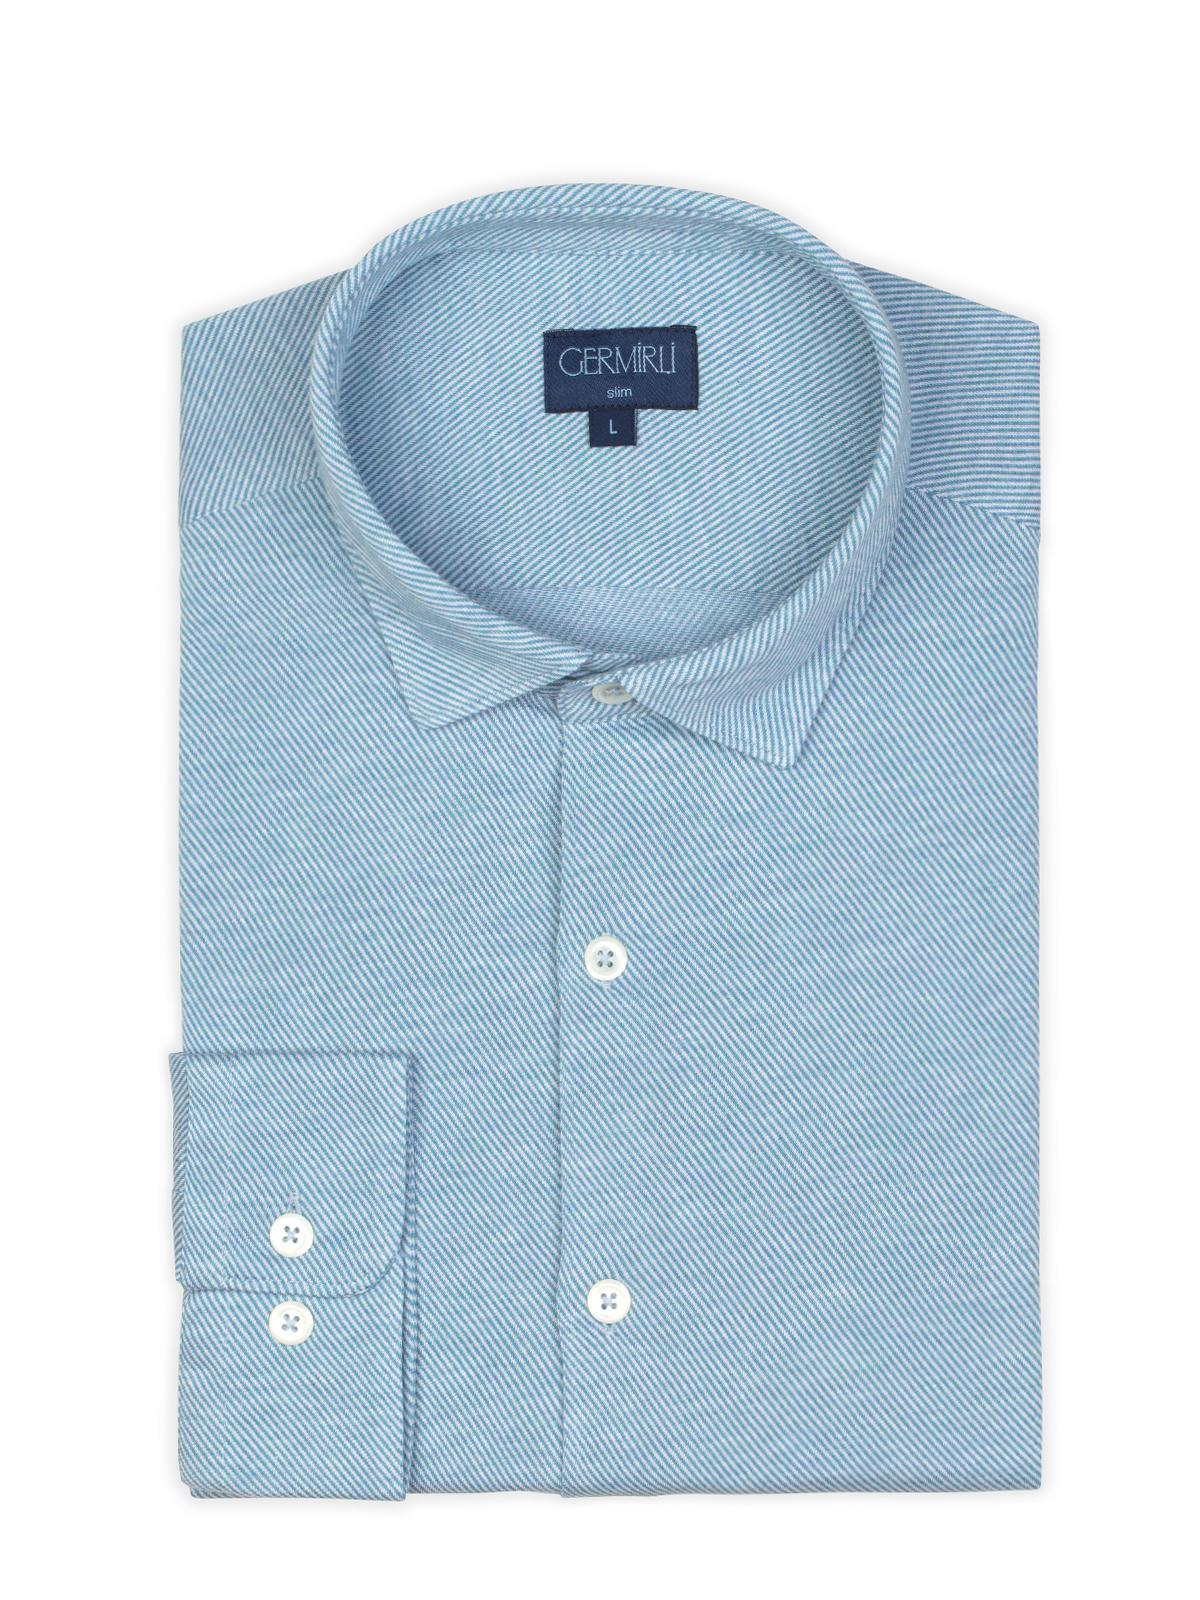 Germirli Light Blue Twill Combed Cotton Fabric Semi Spread Knitting Slim Fit Shirt